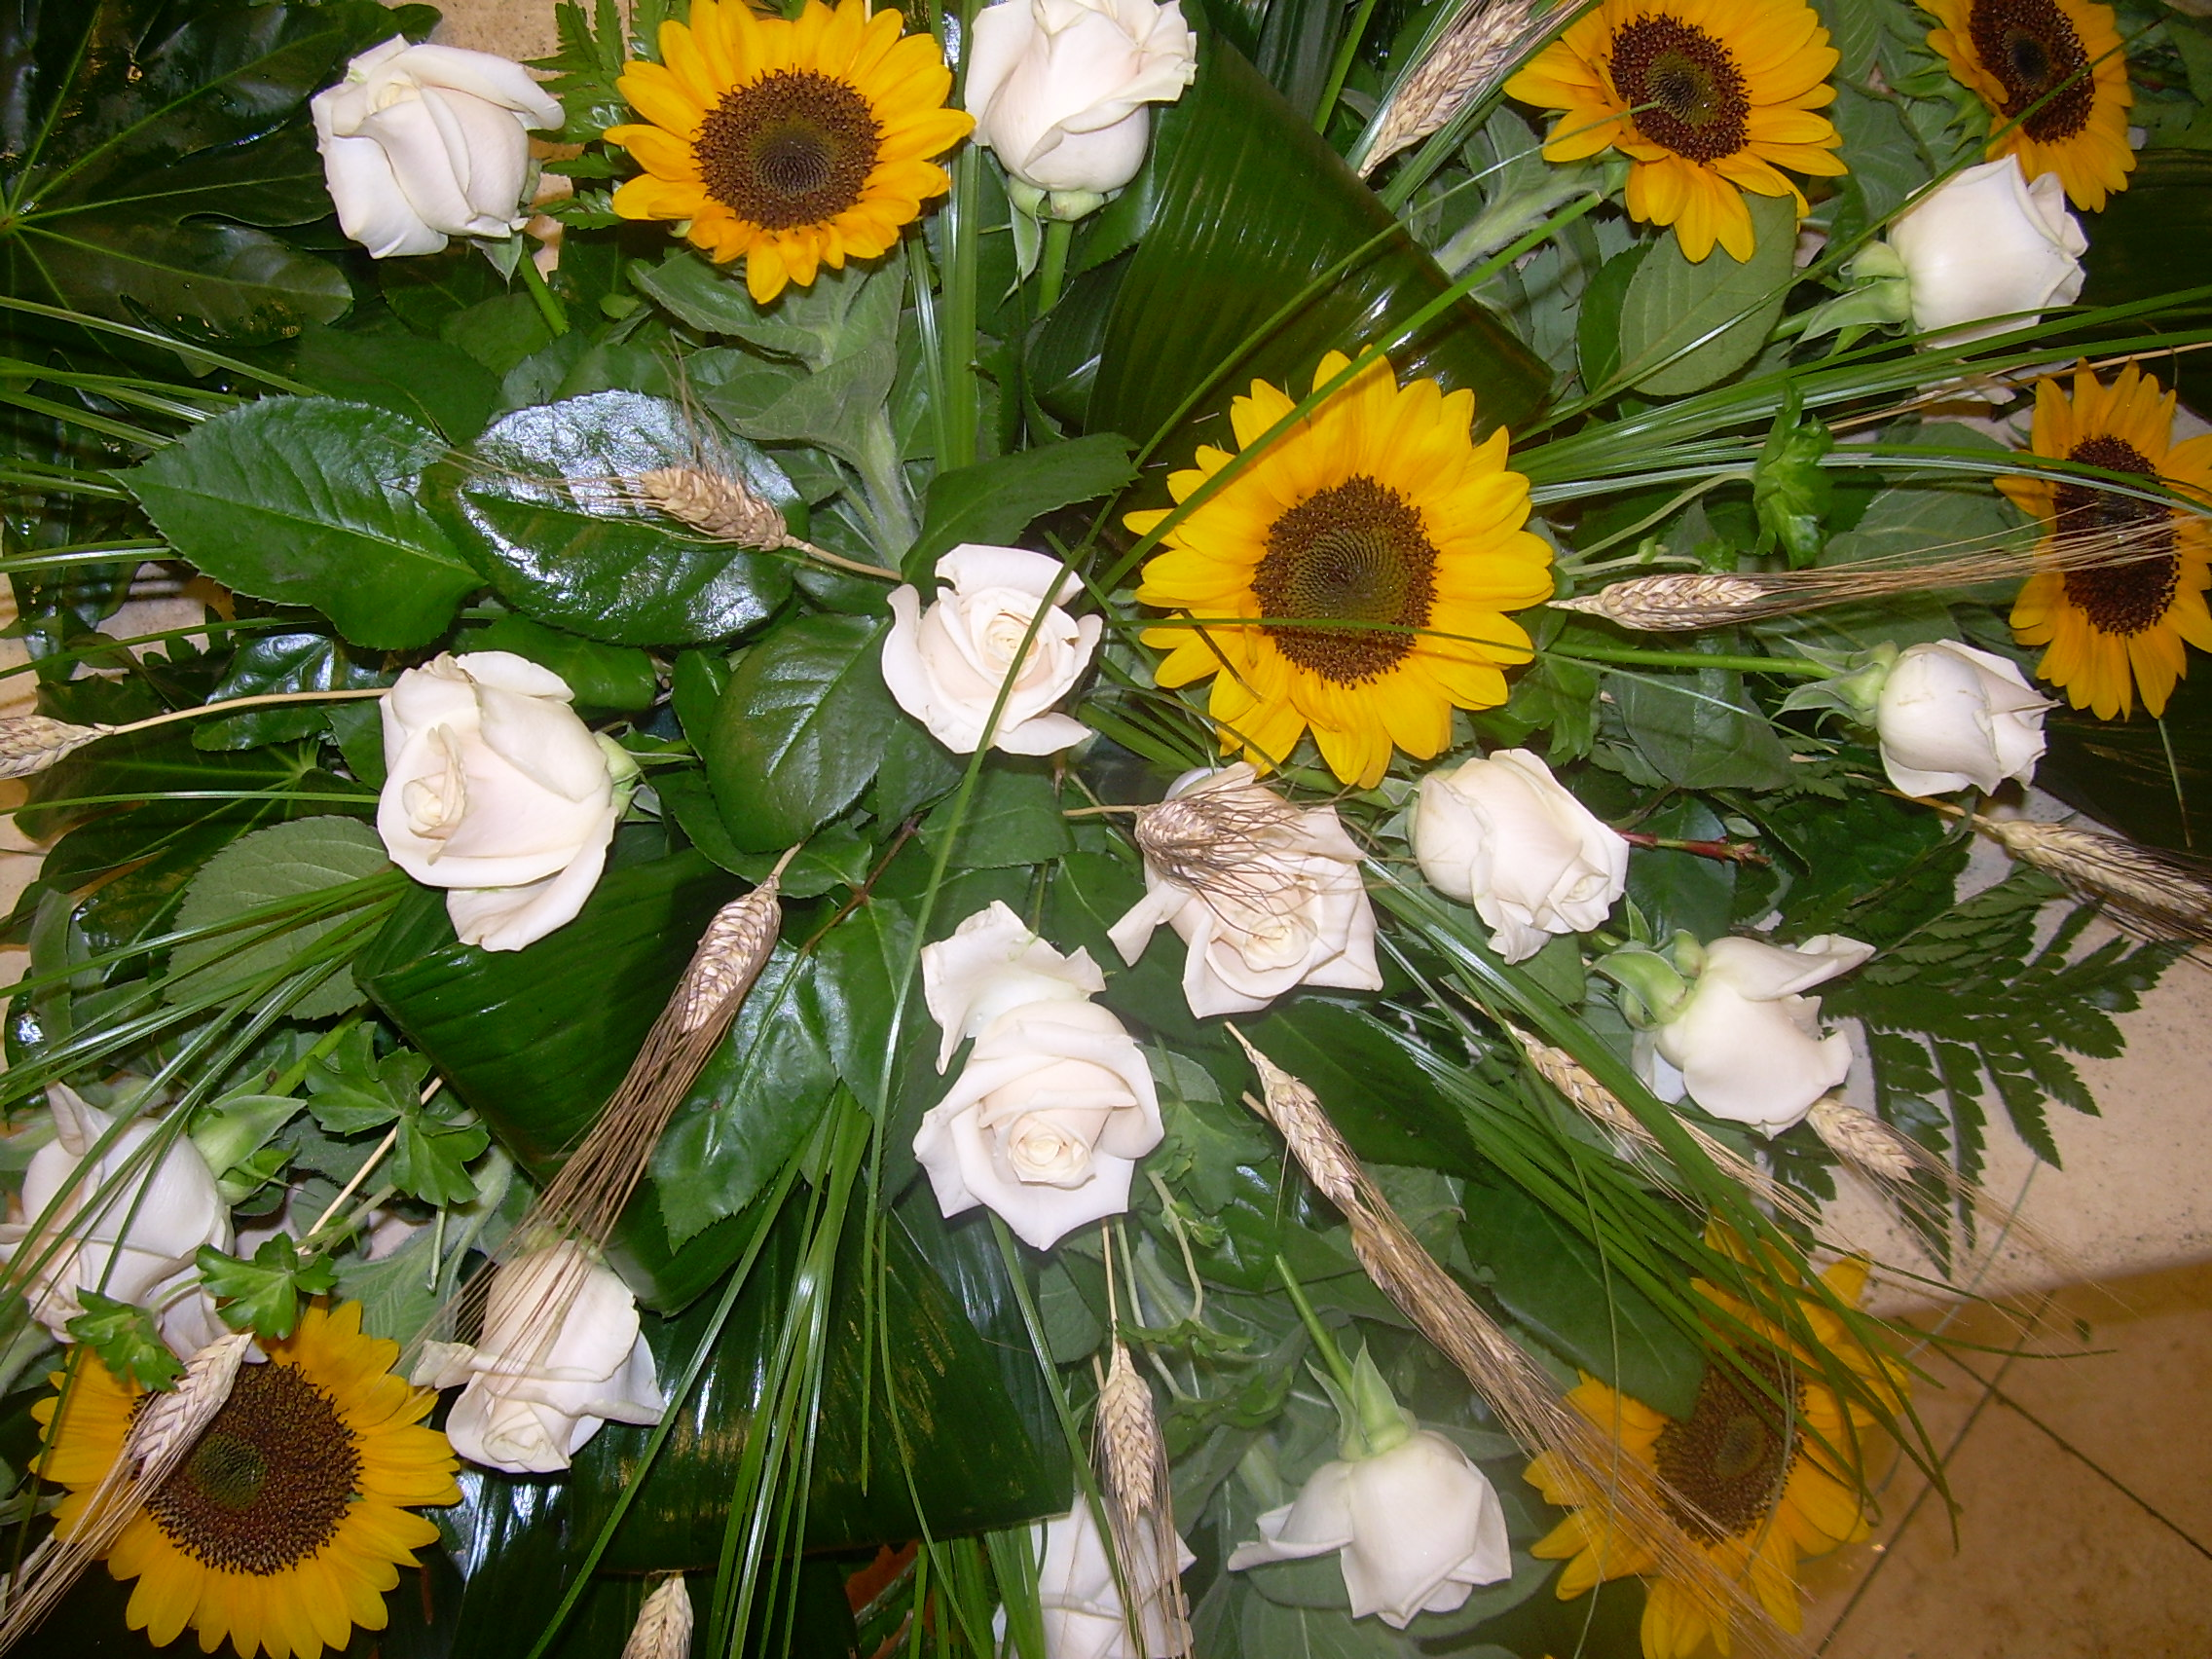 Matrimonio Girasoli E Spighe : Elisabetta fiori e piante centrotavola cadente con rose